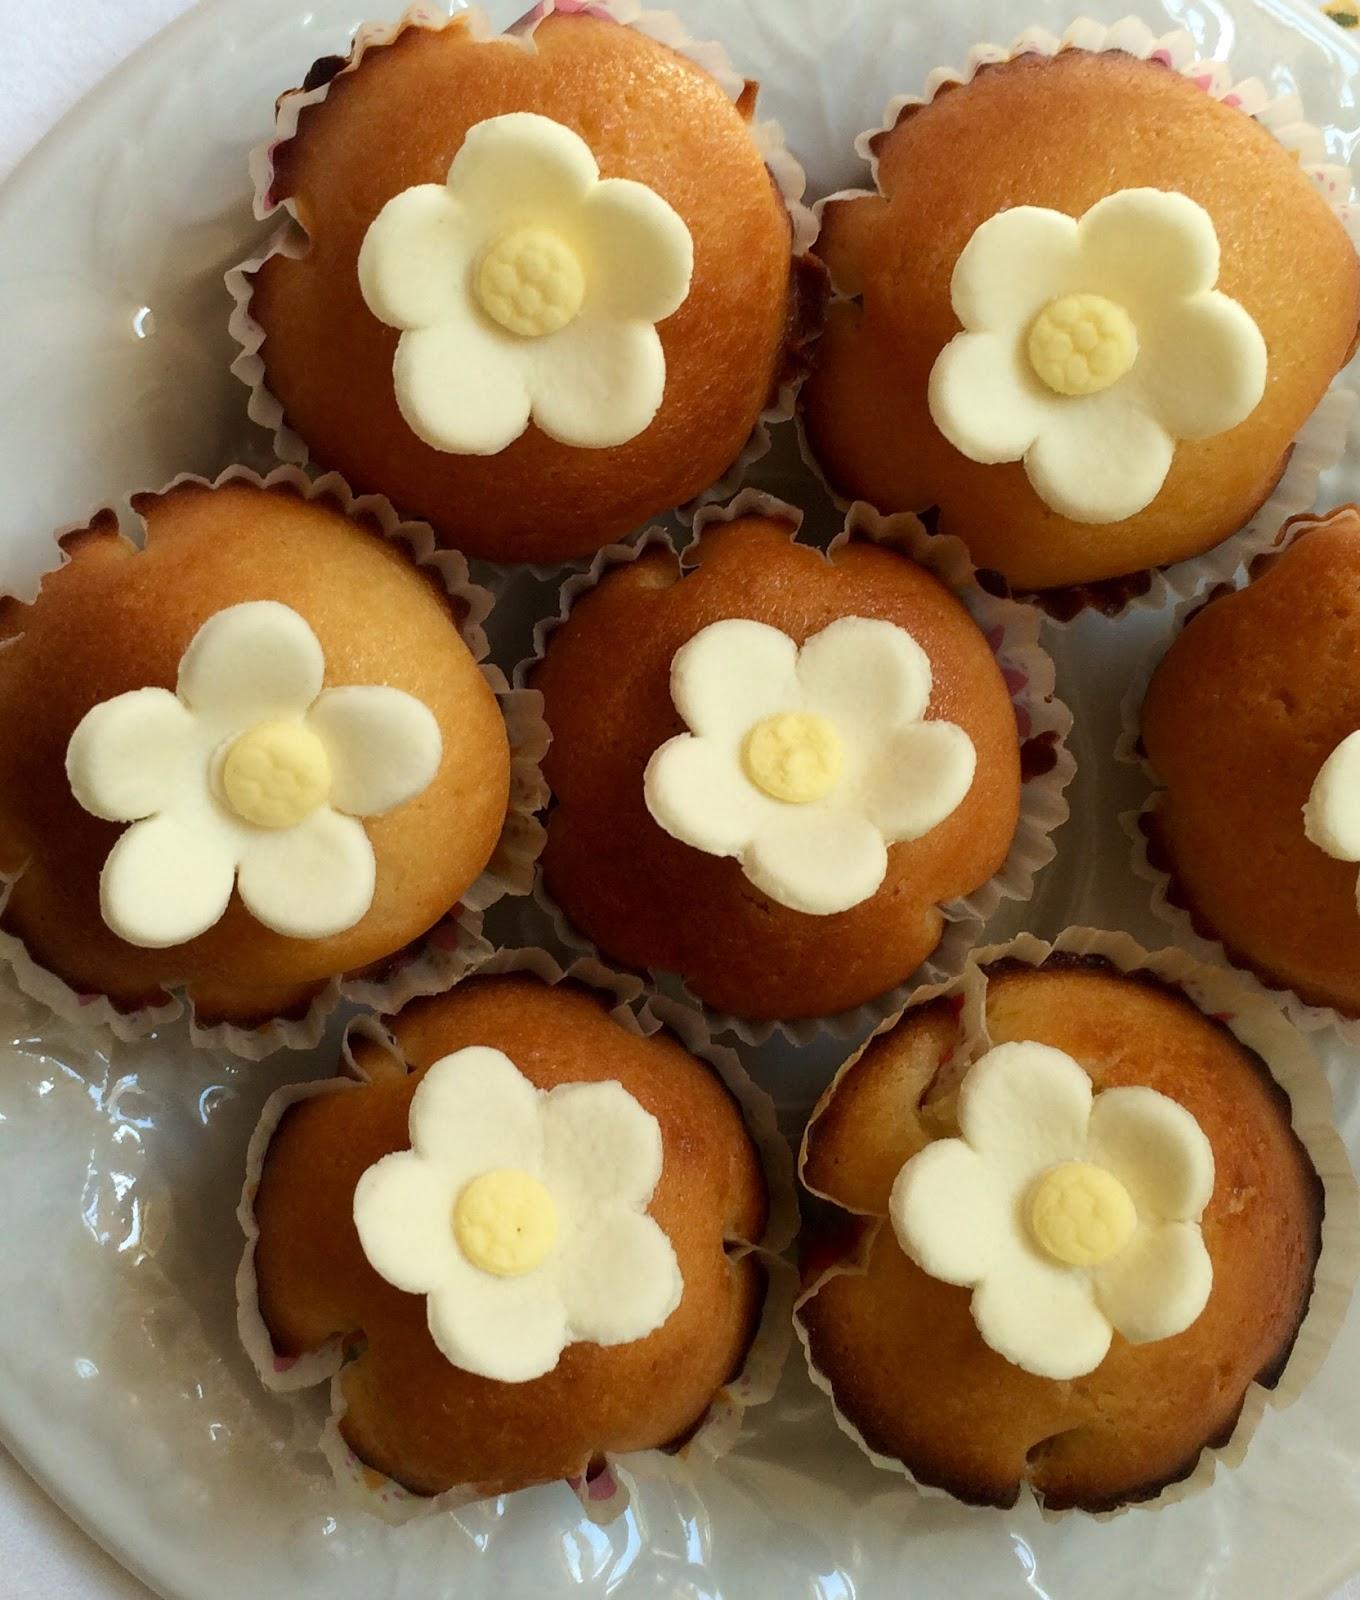 Ina Garten Cupcakes miss patisserie: lemon-yogurt cupcakes {ina garten recipe}